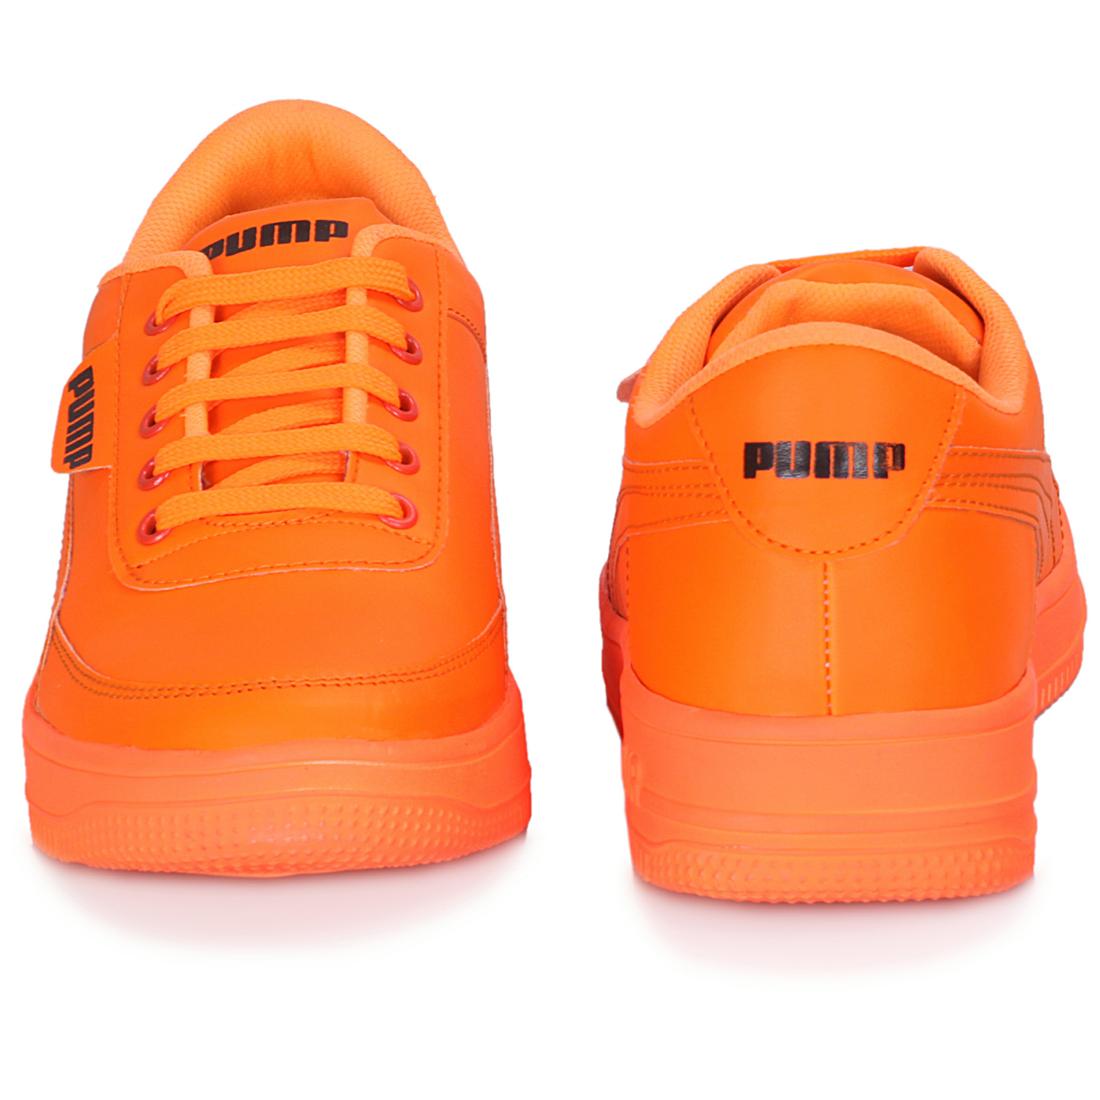 IMCOLUS374A.351_ORANGE STYLESH & FANCY Casual Shoes SHOE FOR MEN'S IMCOLUS374A.351_OR (ORANGE, 7-10, 4 PAIR)